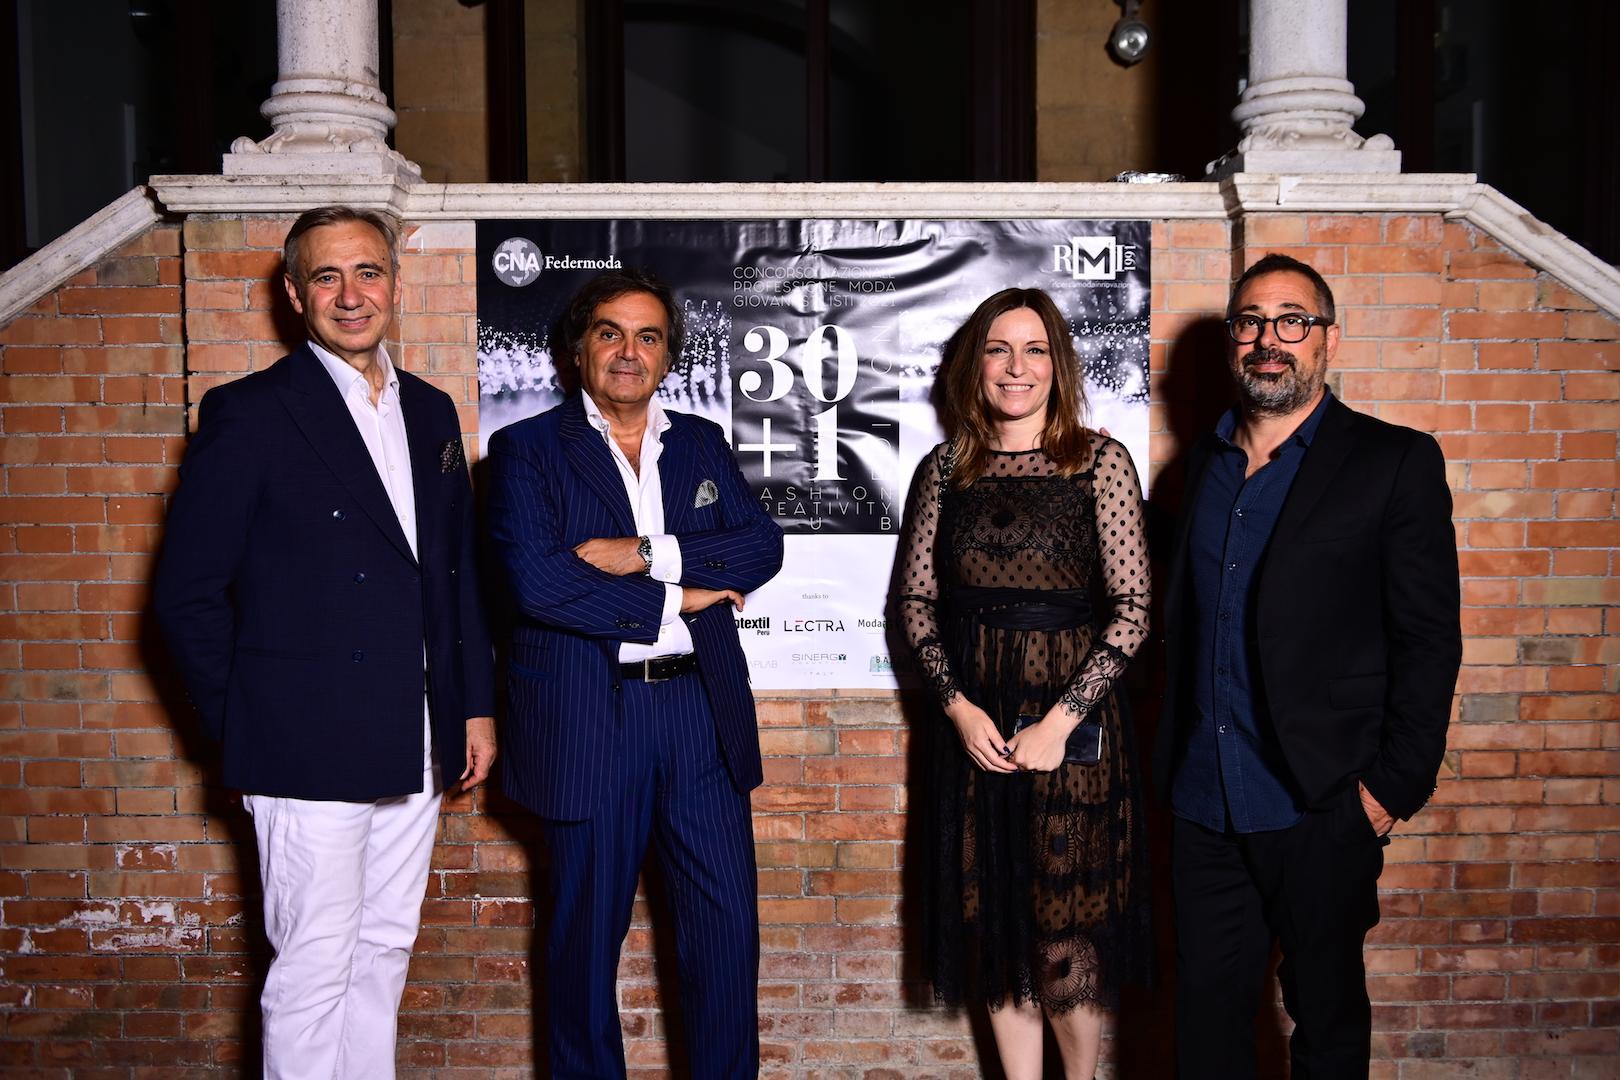 0.1 Robero Corbelli - Antonio Franceschini - Sottsegretario Lucia Borgonzoni -Marco Landi